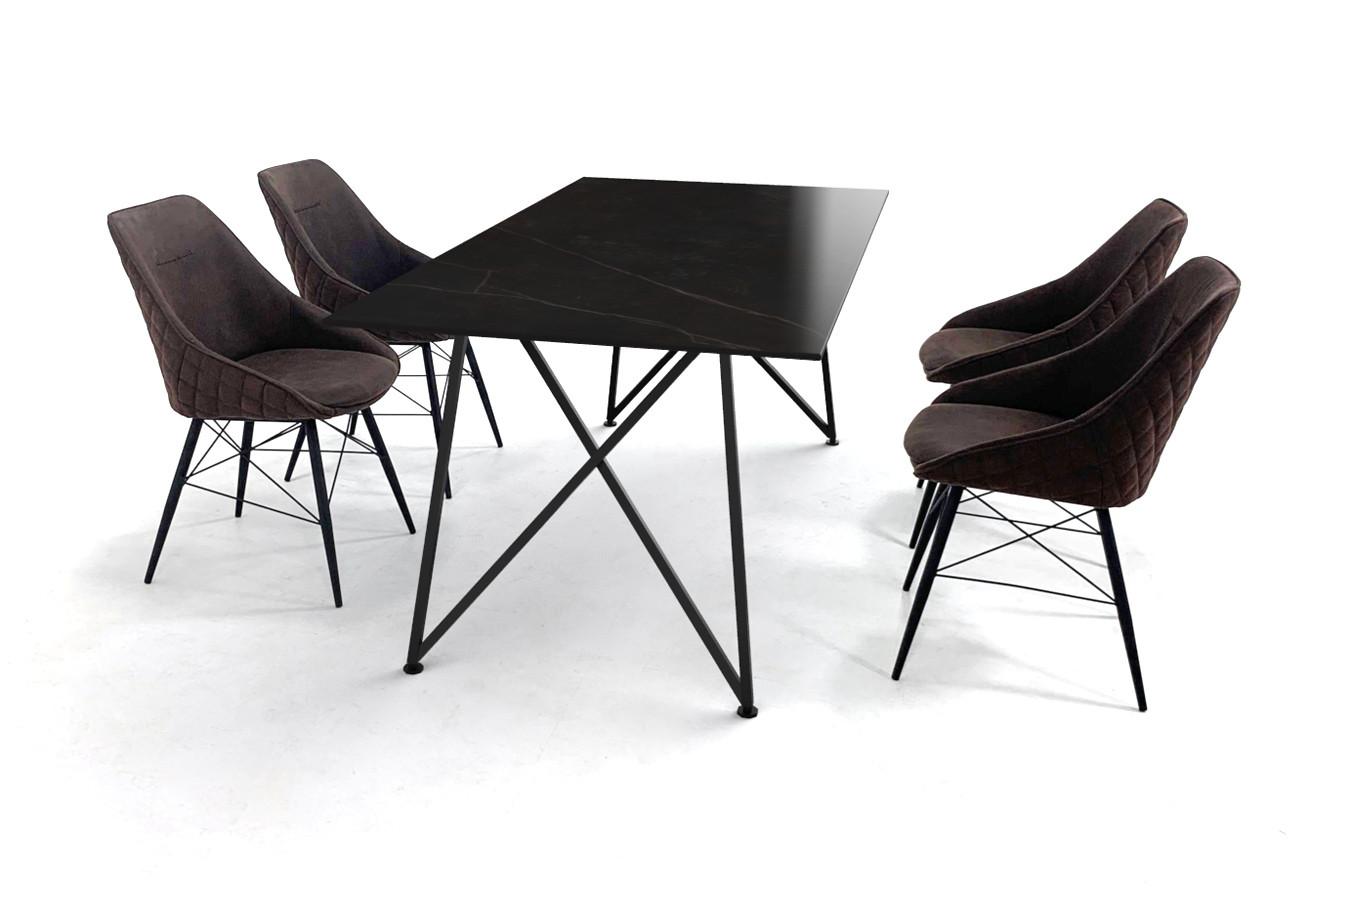 Stijlvolle eettafel met Dekton Kelya tafelblad en stoffen stoelen